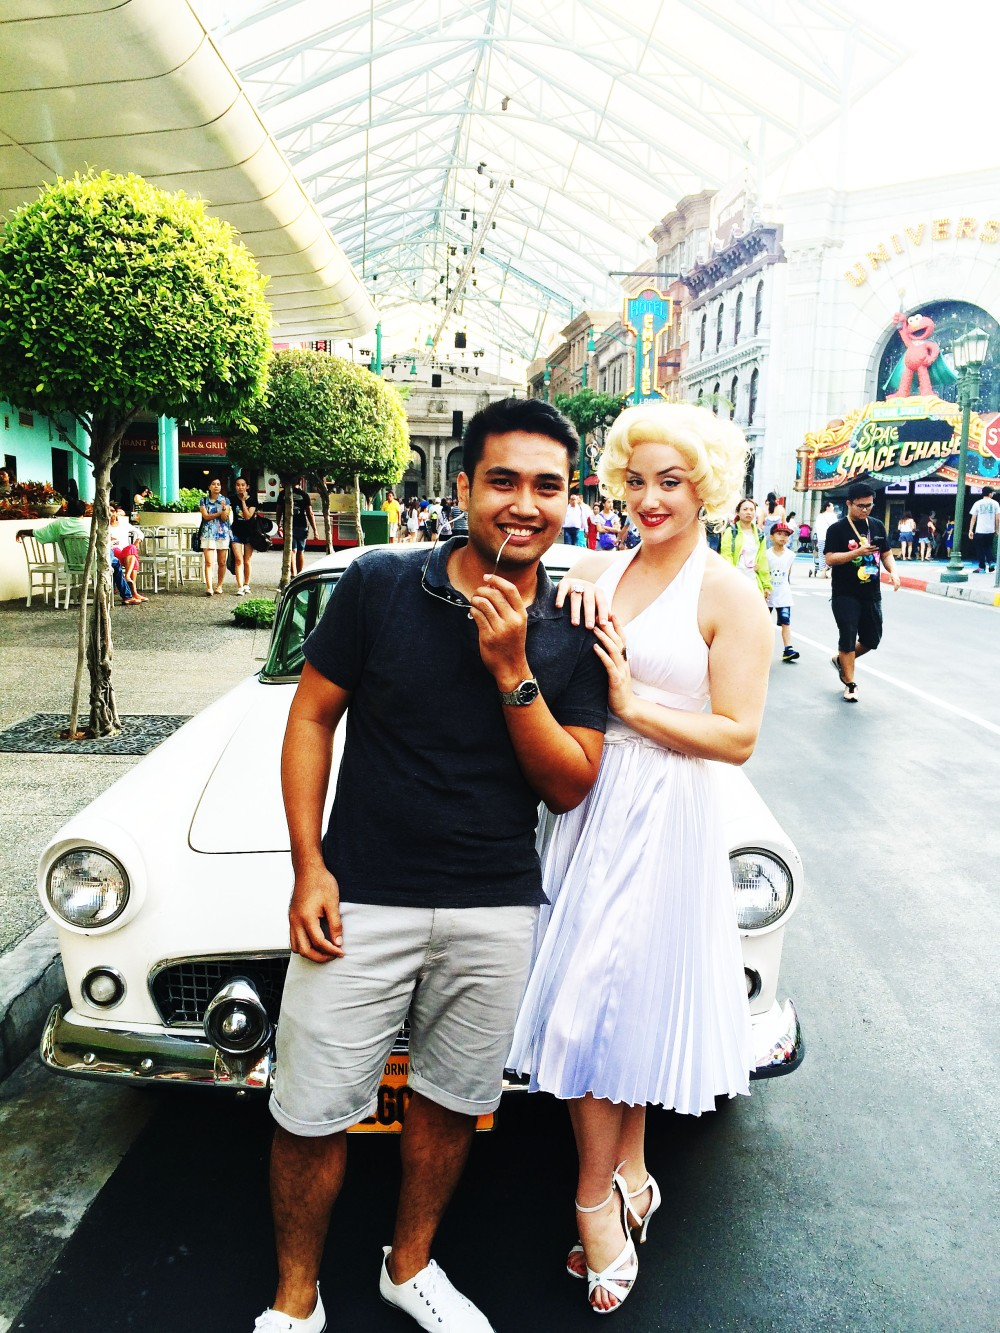 Marilyn flirting haha